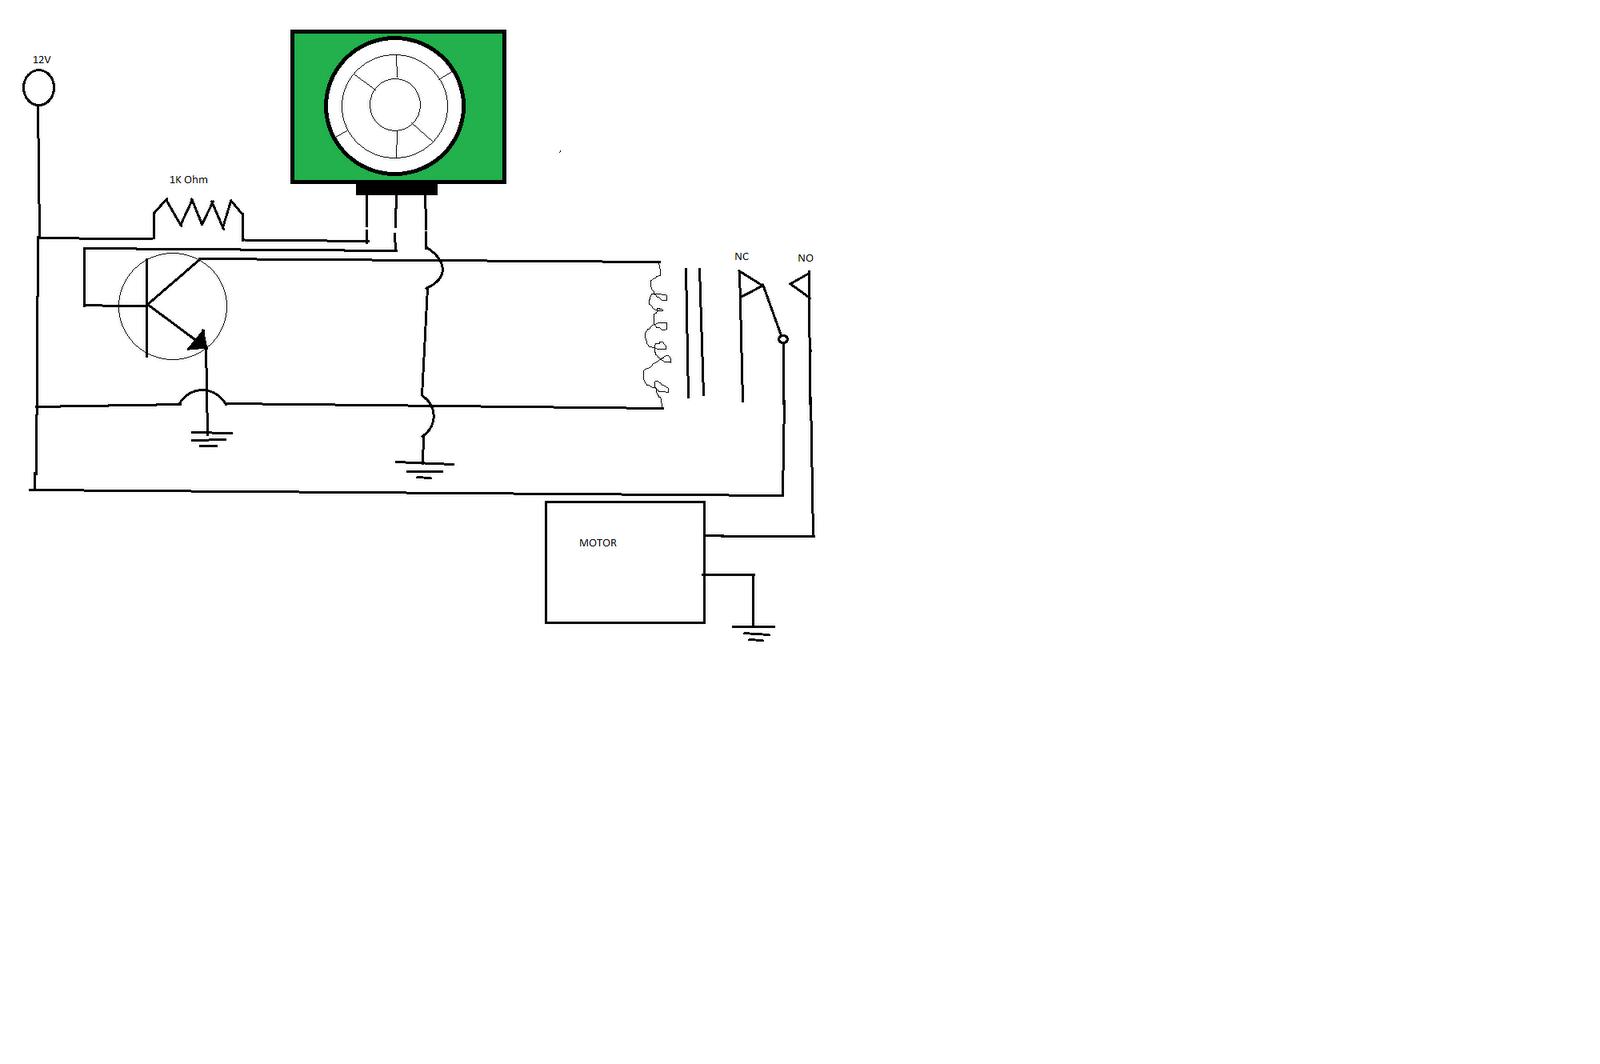 Stationary Infrared-sensing/ remote-controlled nerf shotgun